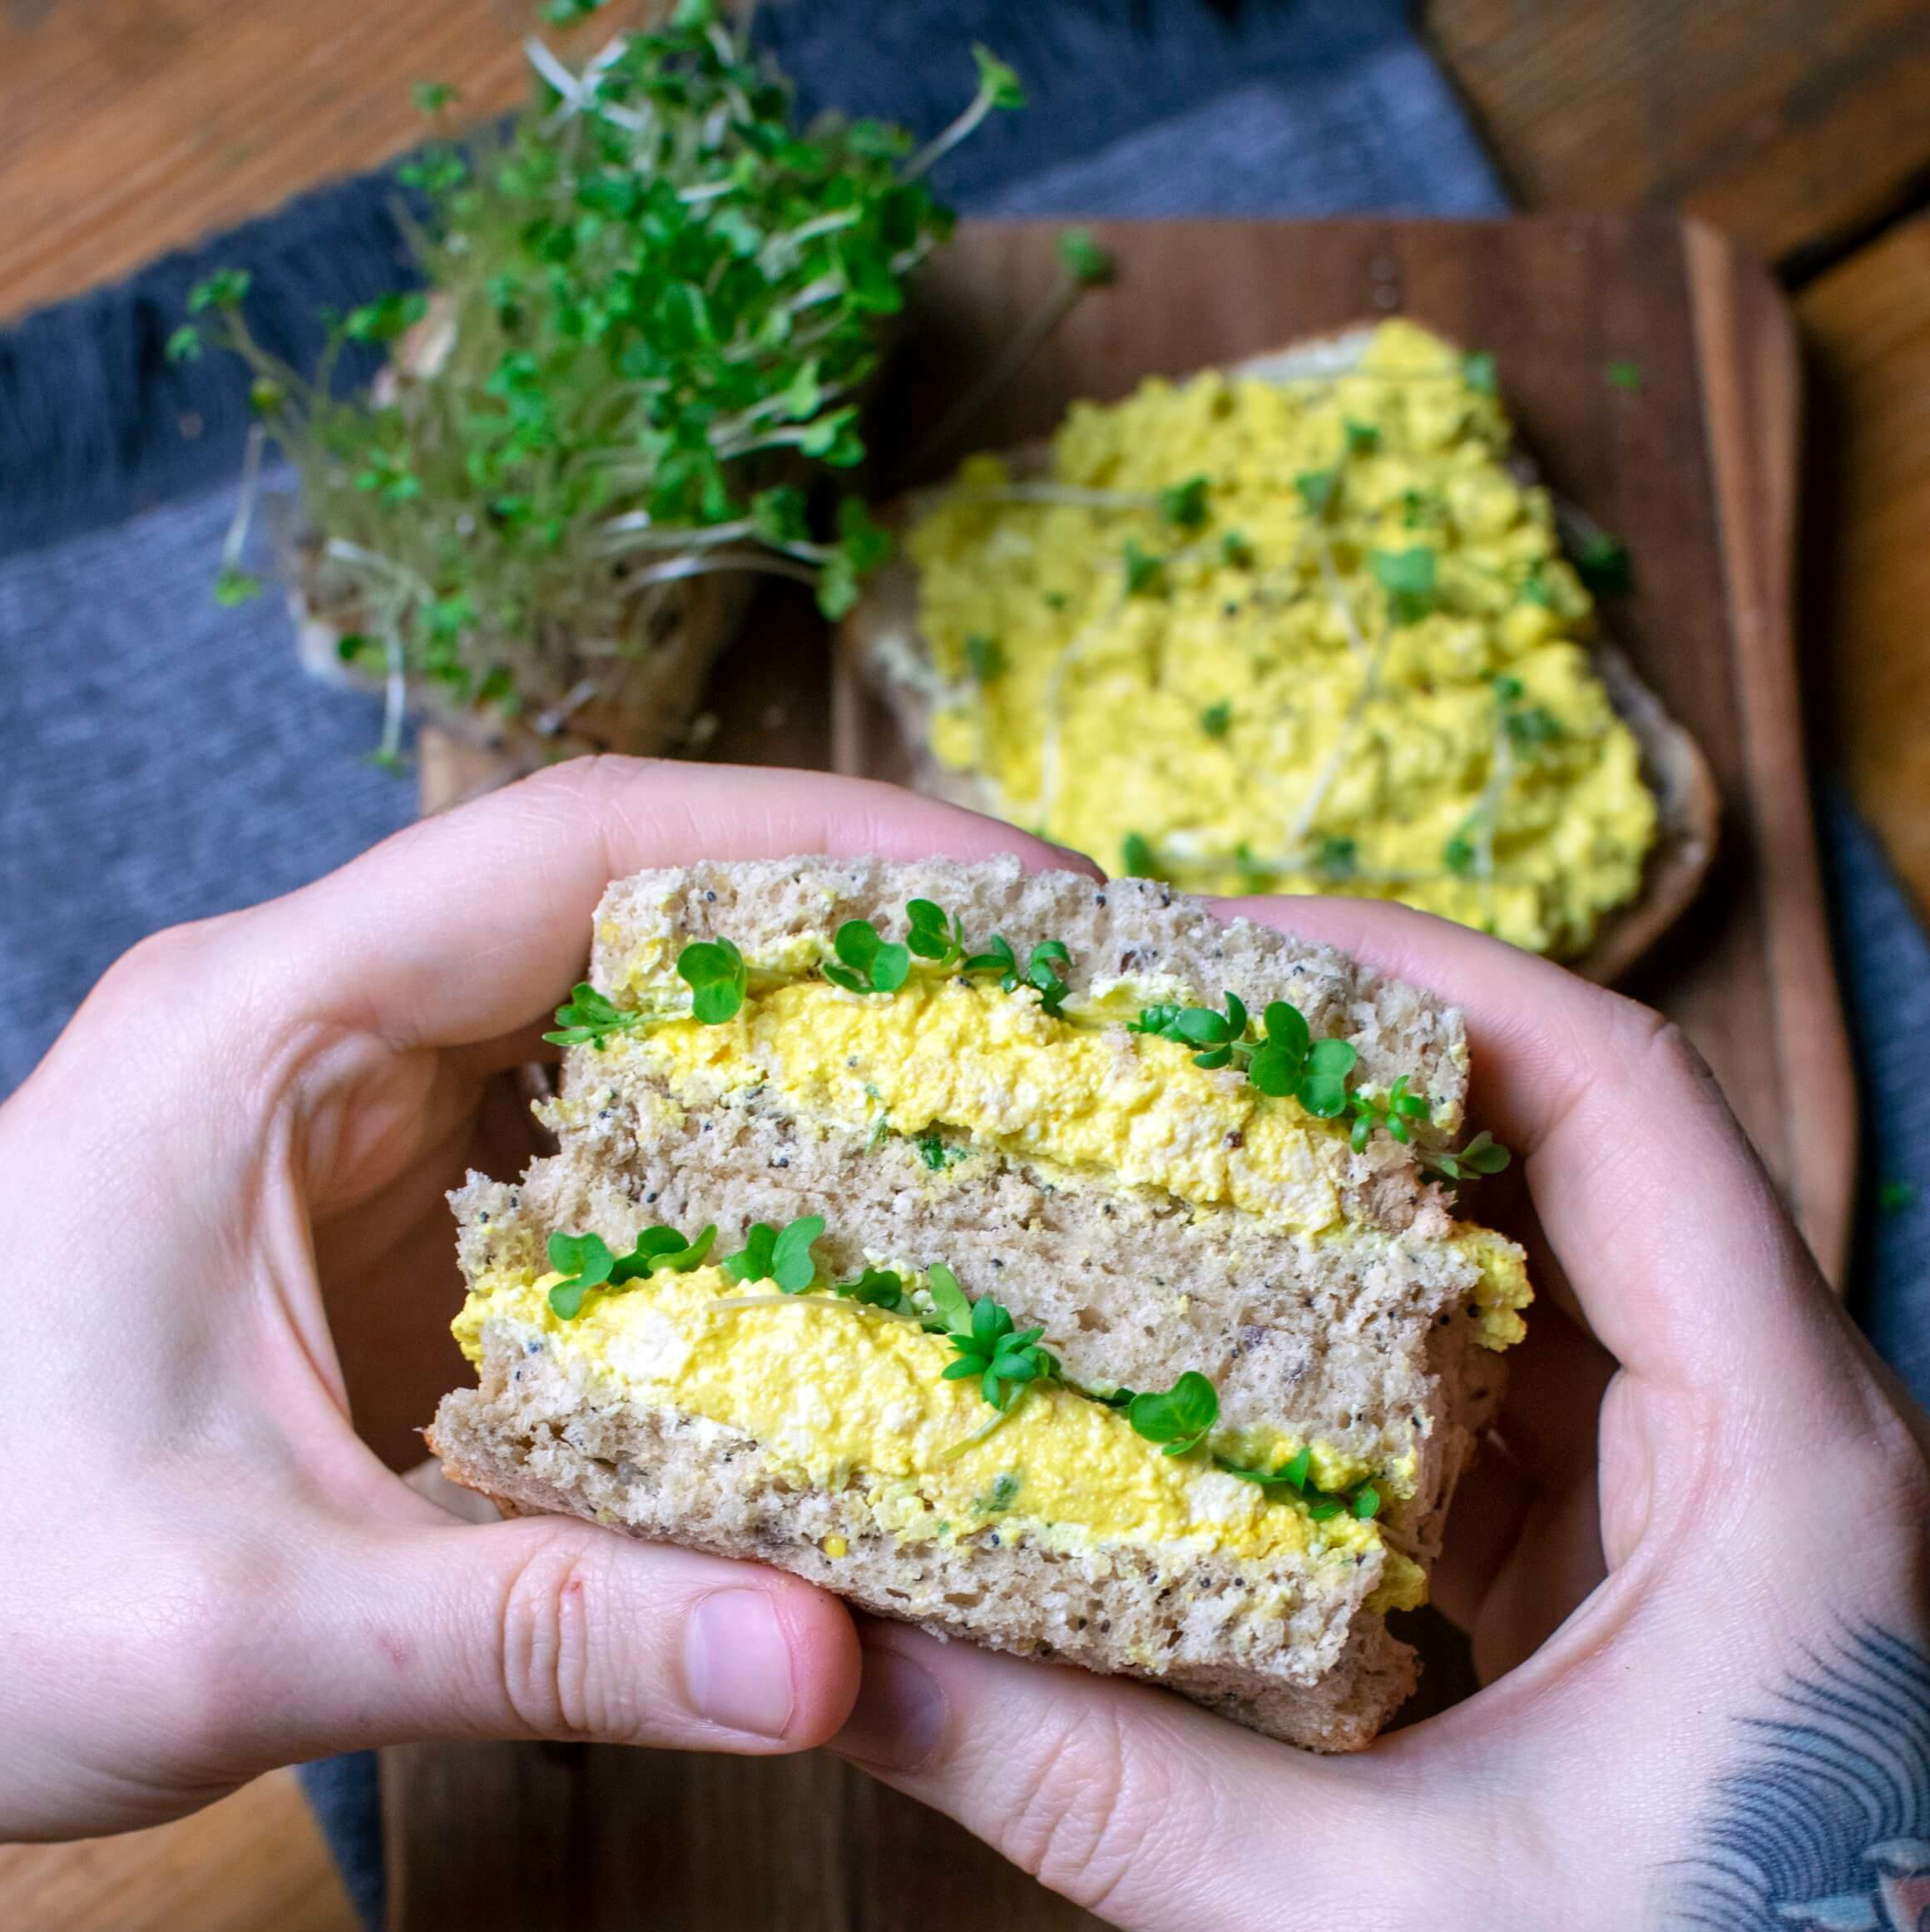 Who Needs Eggs When This Vegan Tofu Salad Exists?